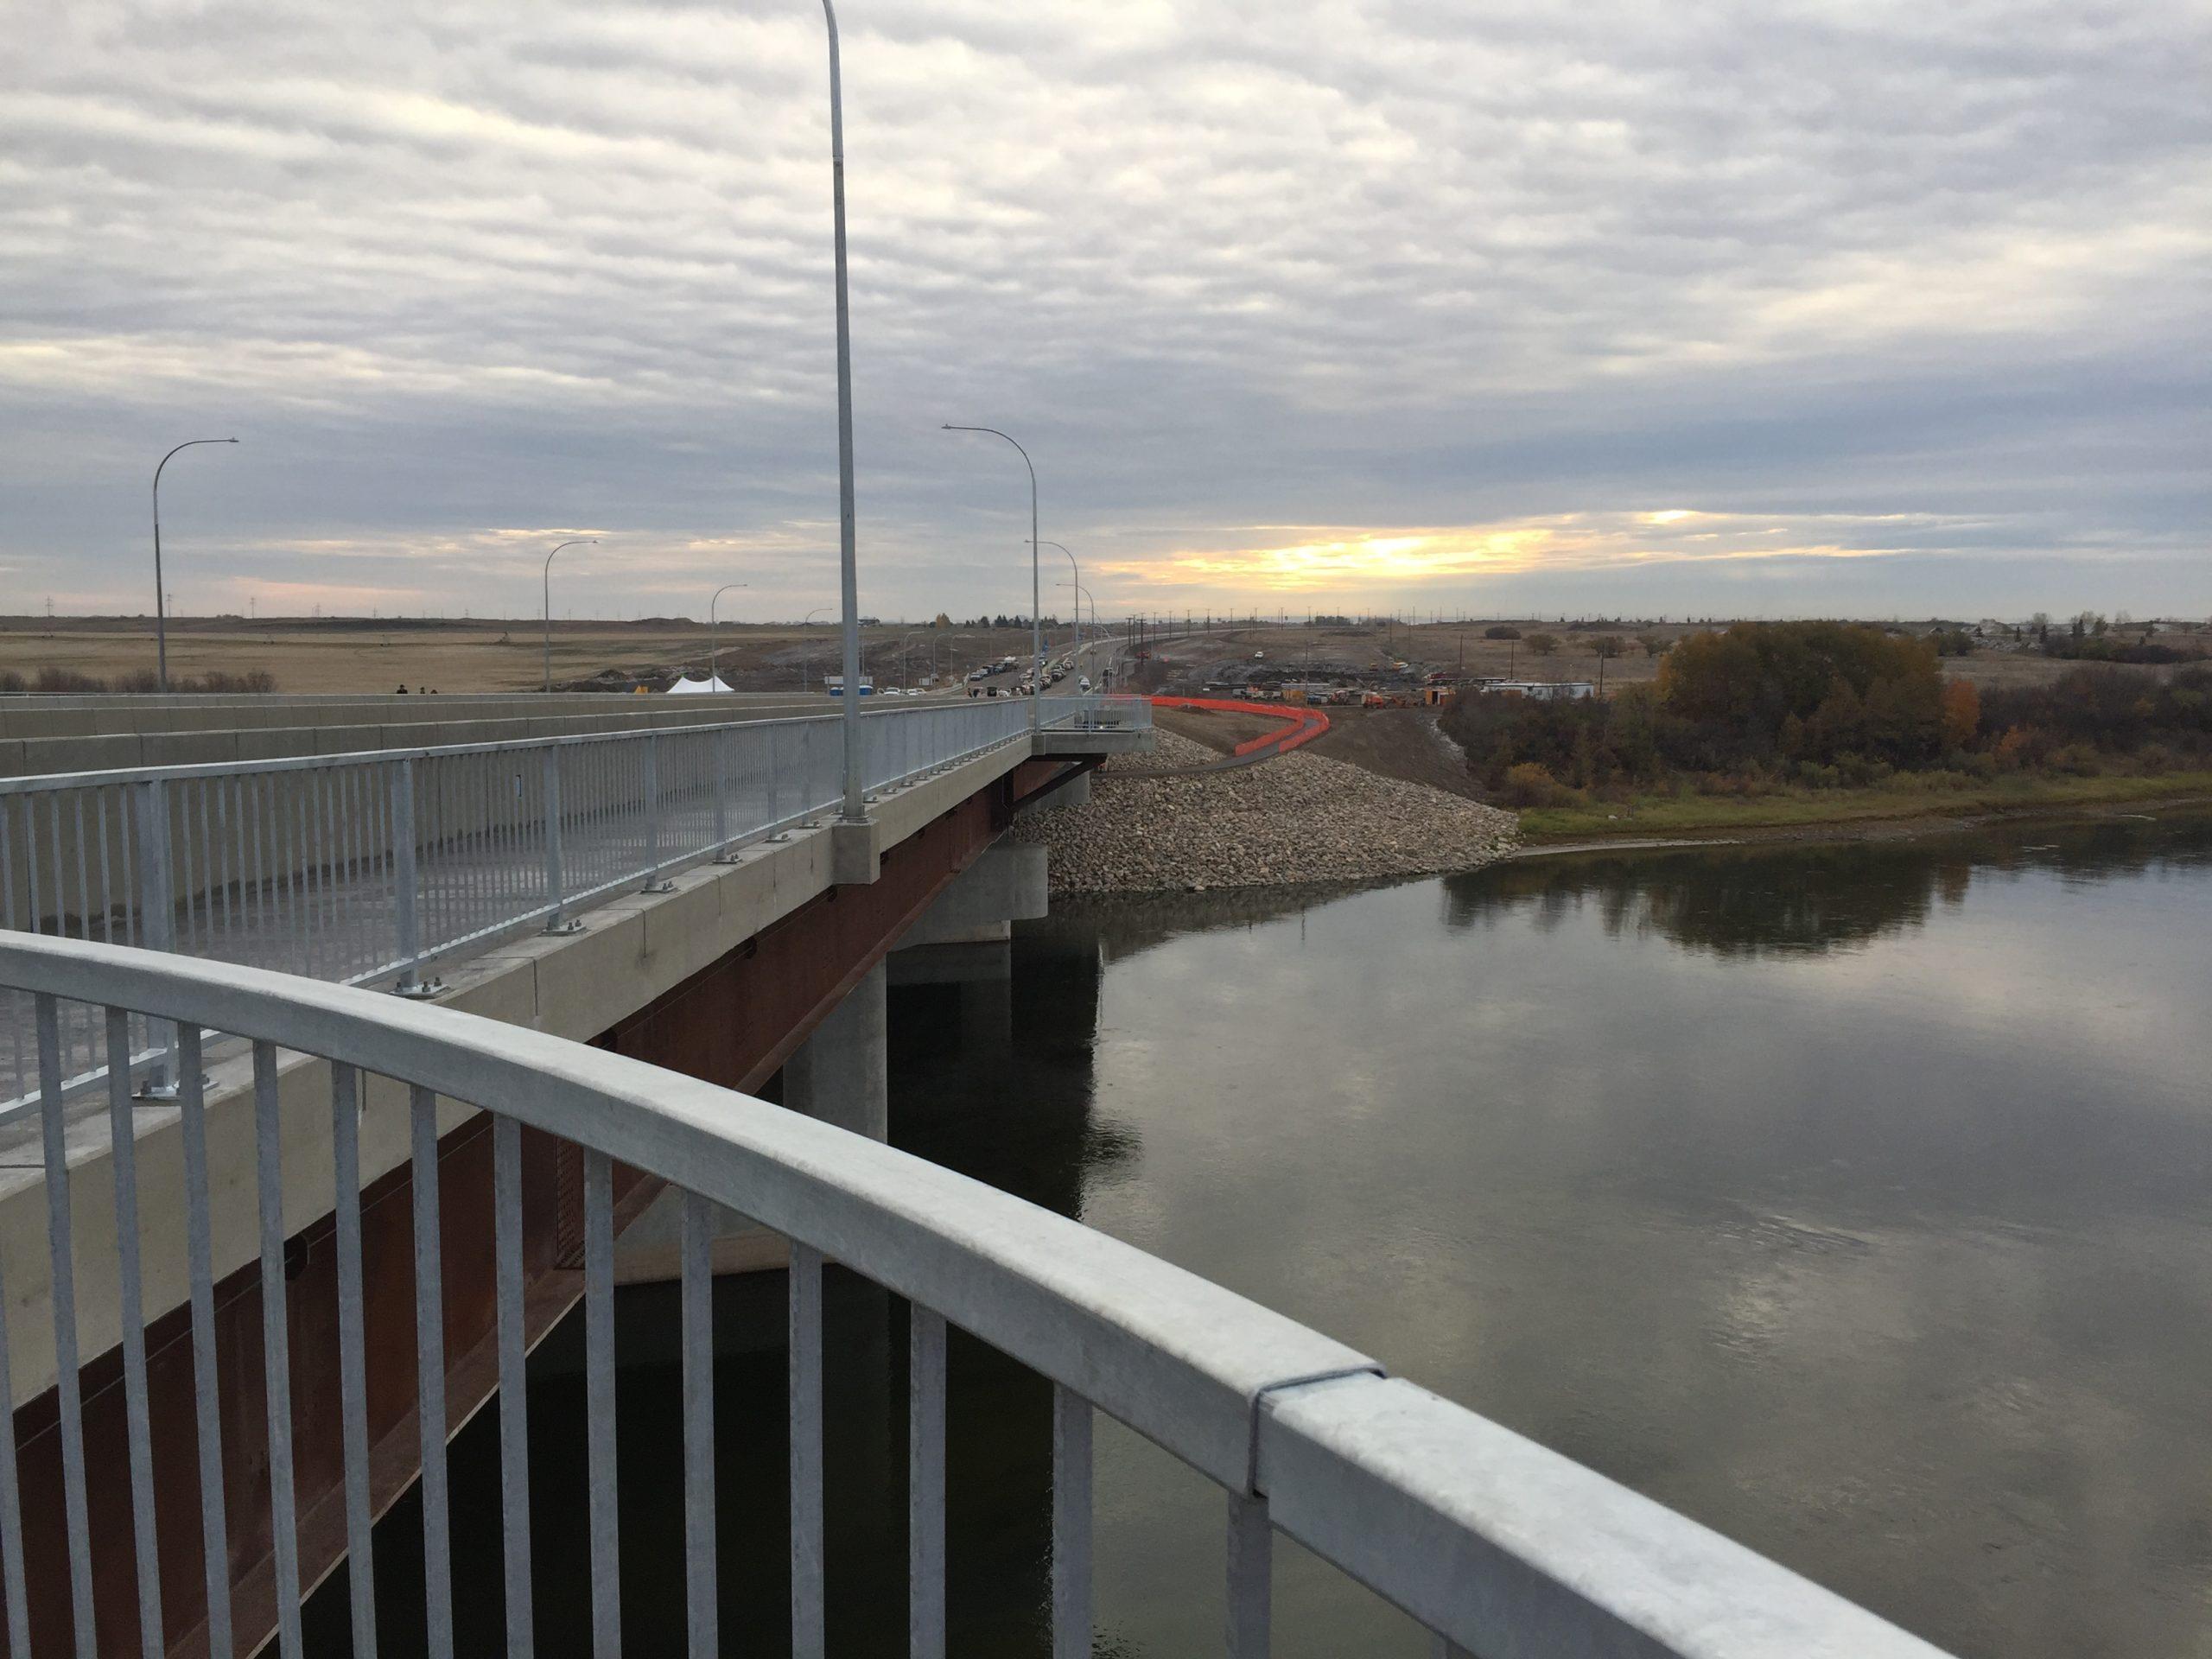 Saskatoon's Two-Bridge Project Wins National Award